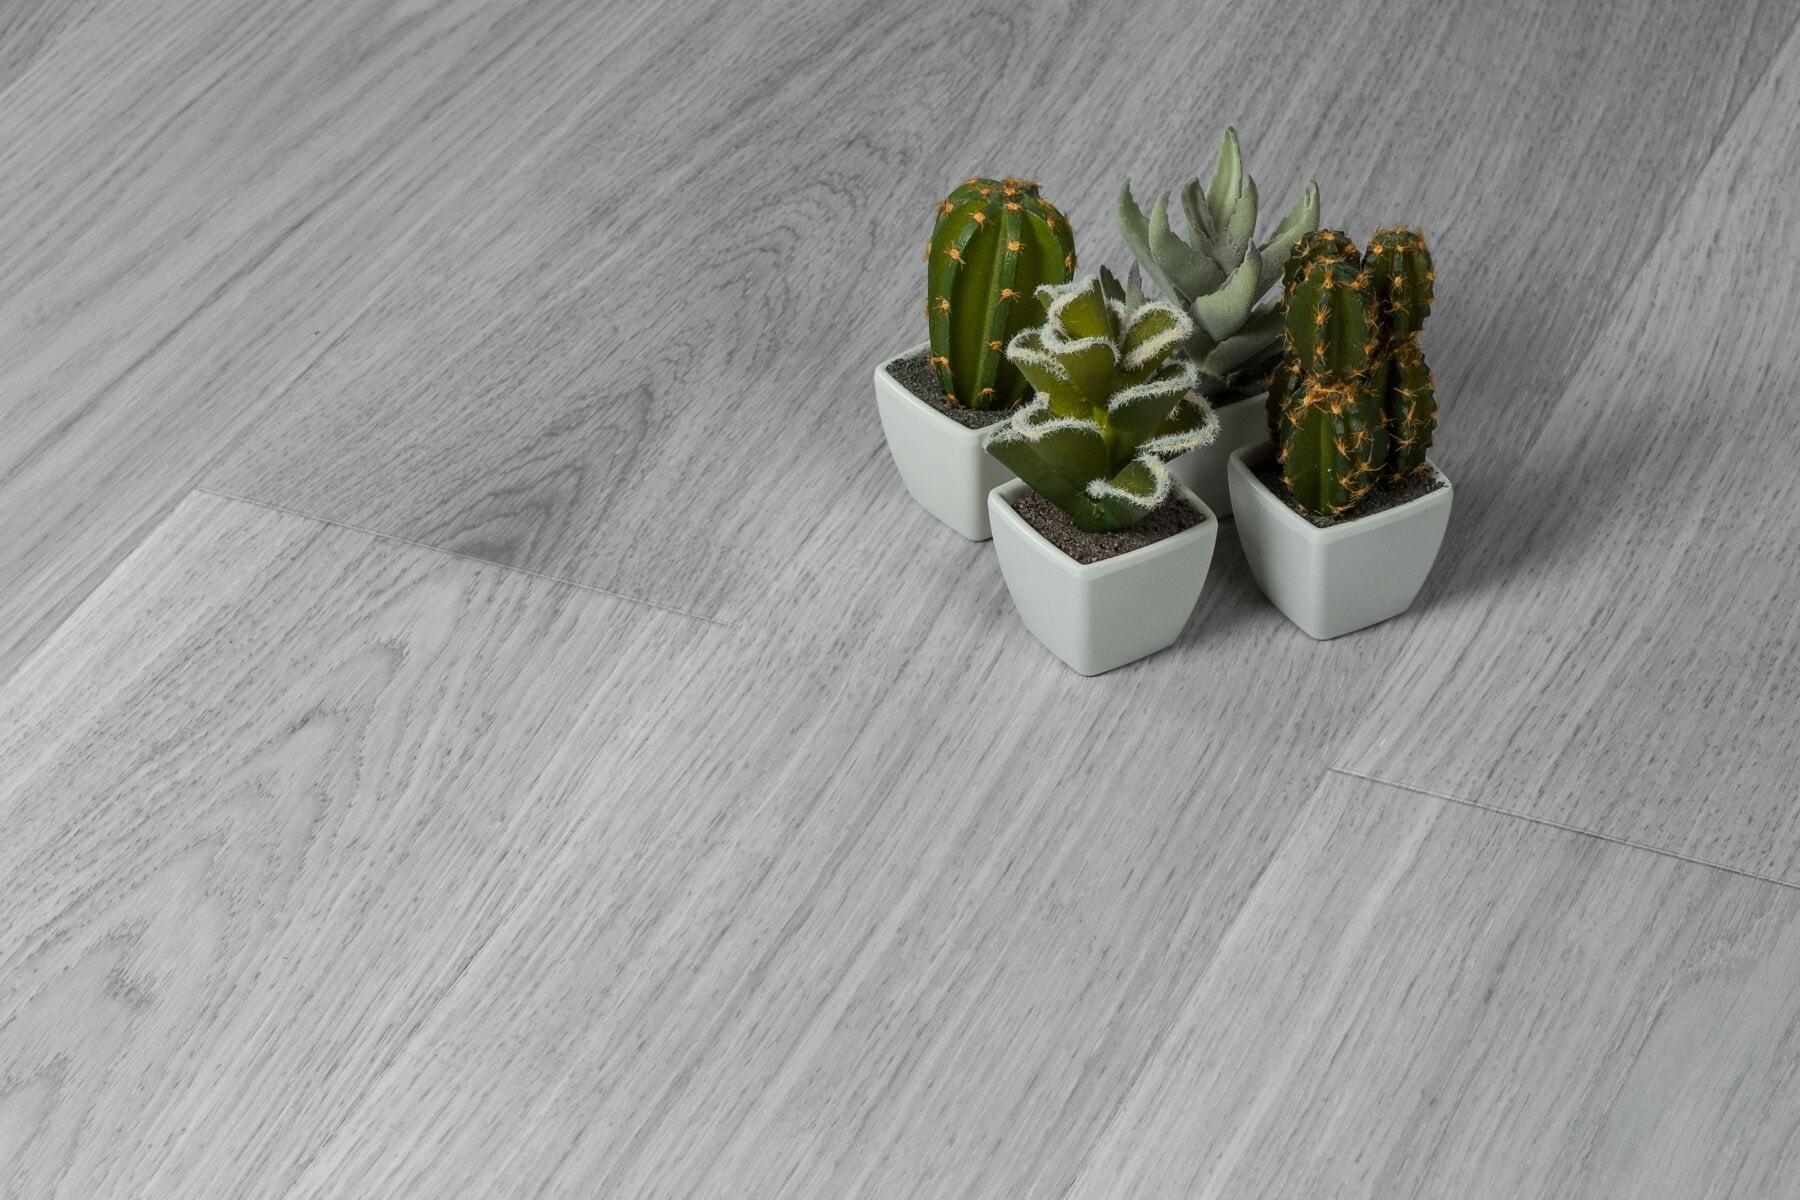 minimalisme, kaktus, miniatyr, blomster, blomsterpotte, flora, natur, tre, blad, saftige